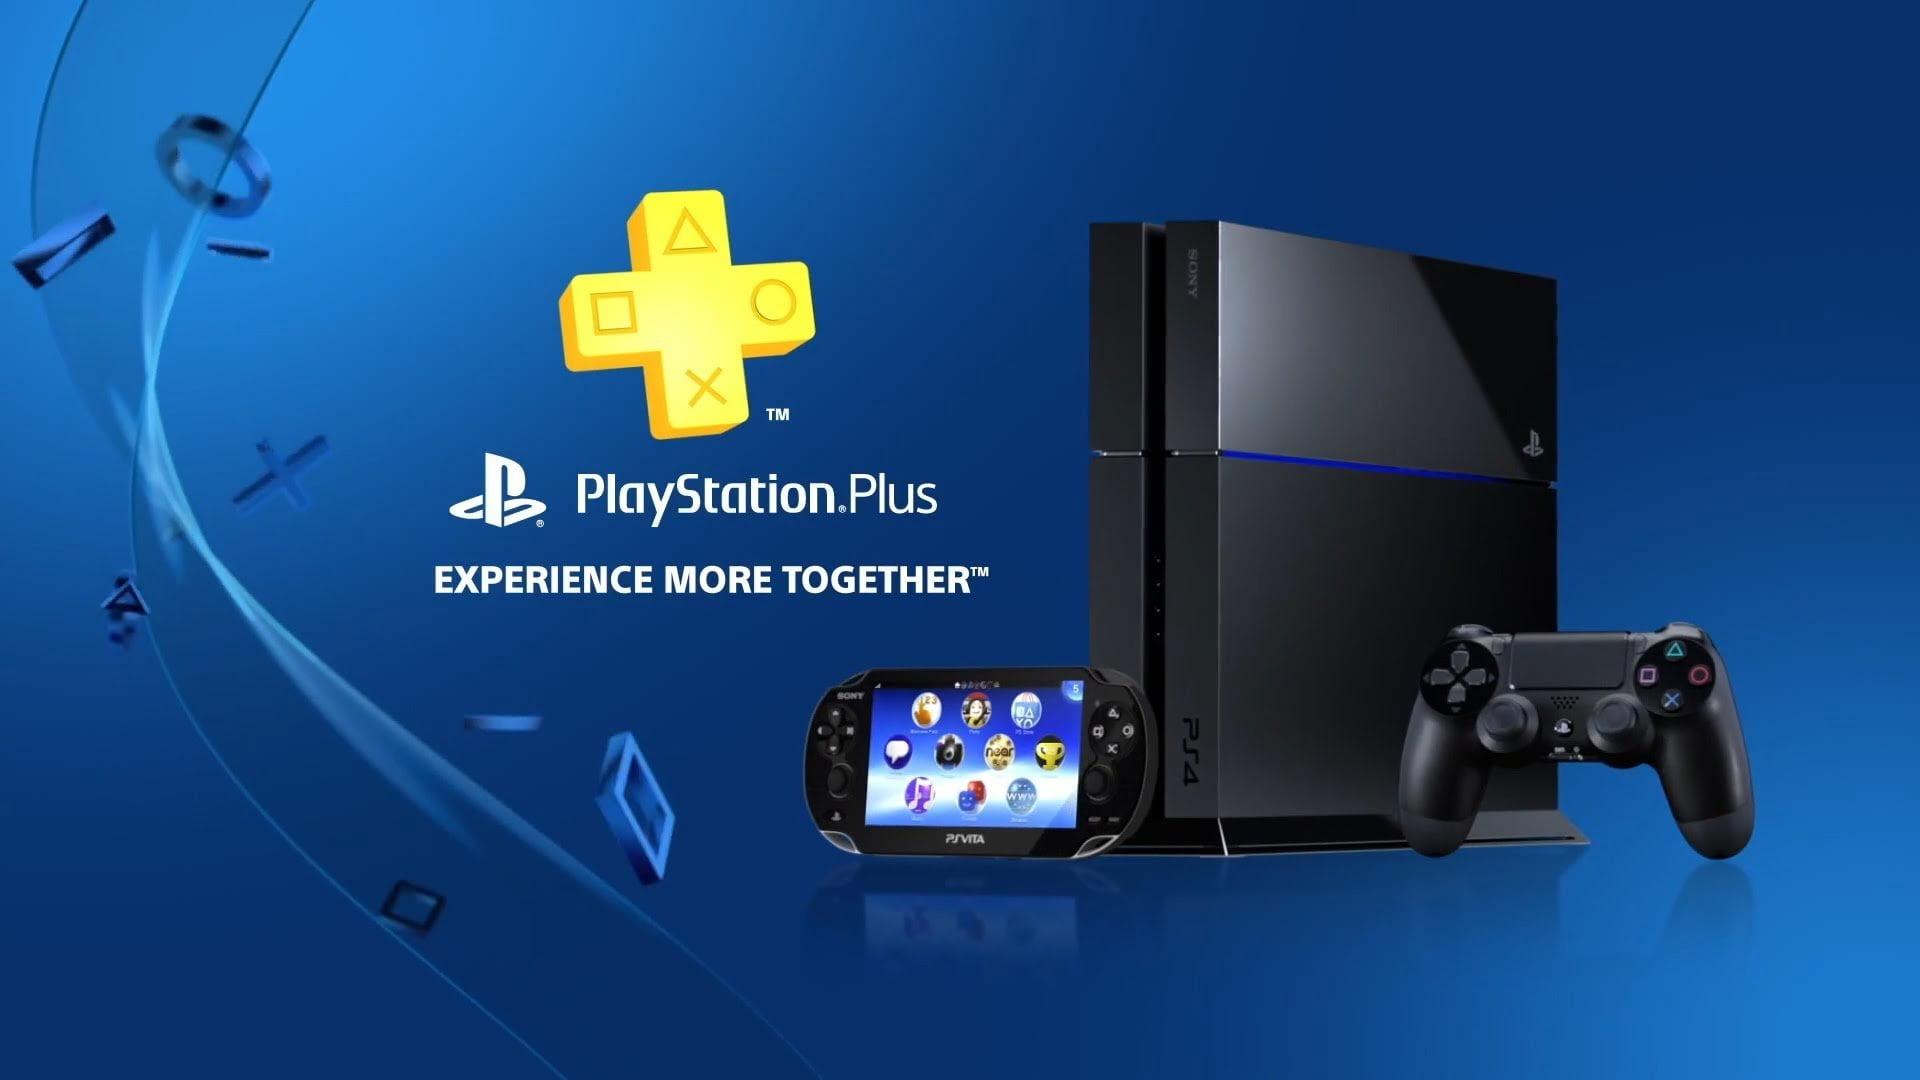 alumnus playstation plus - HD1920×1080